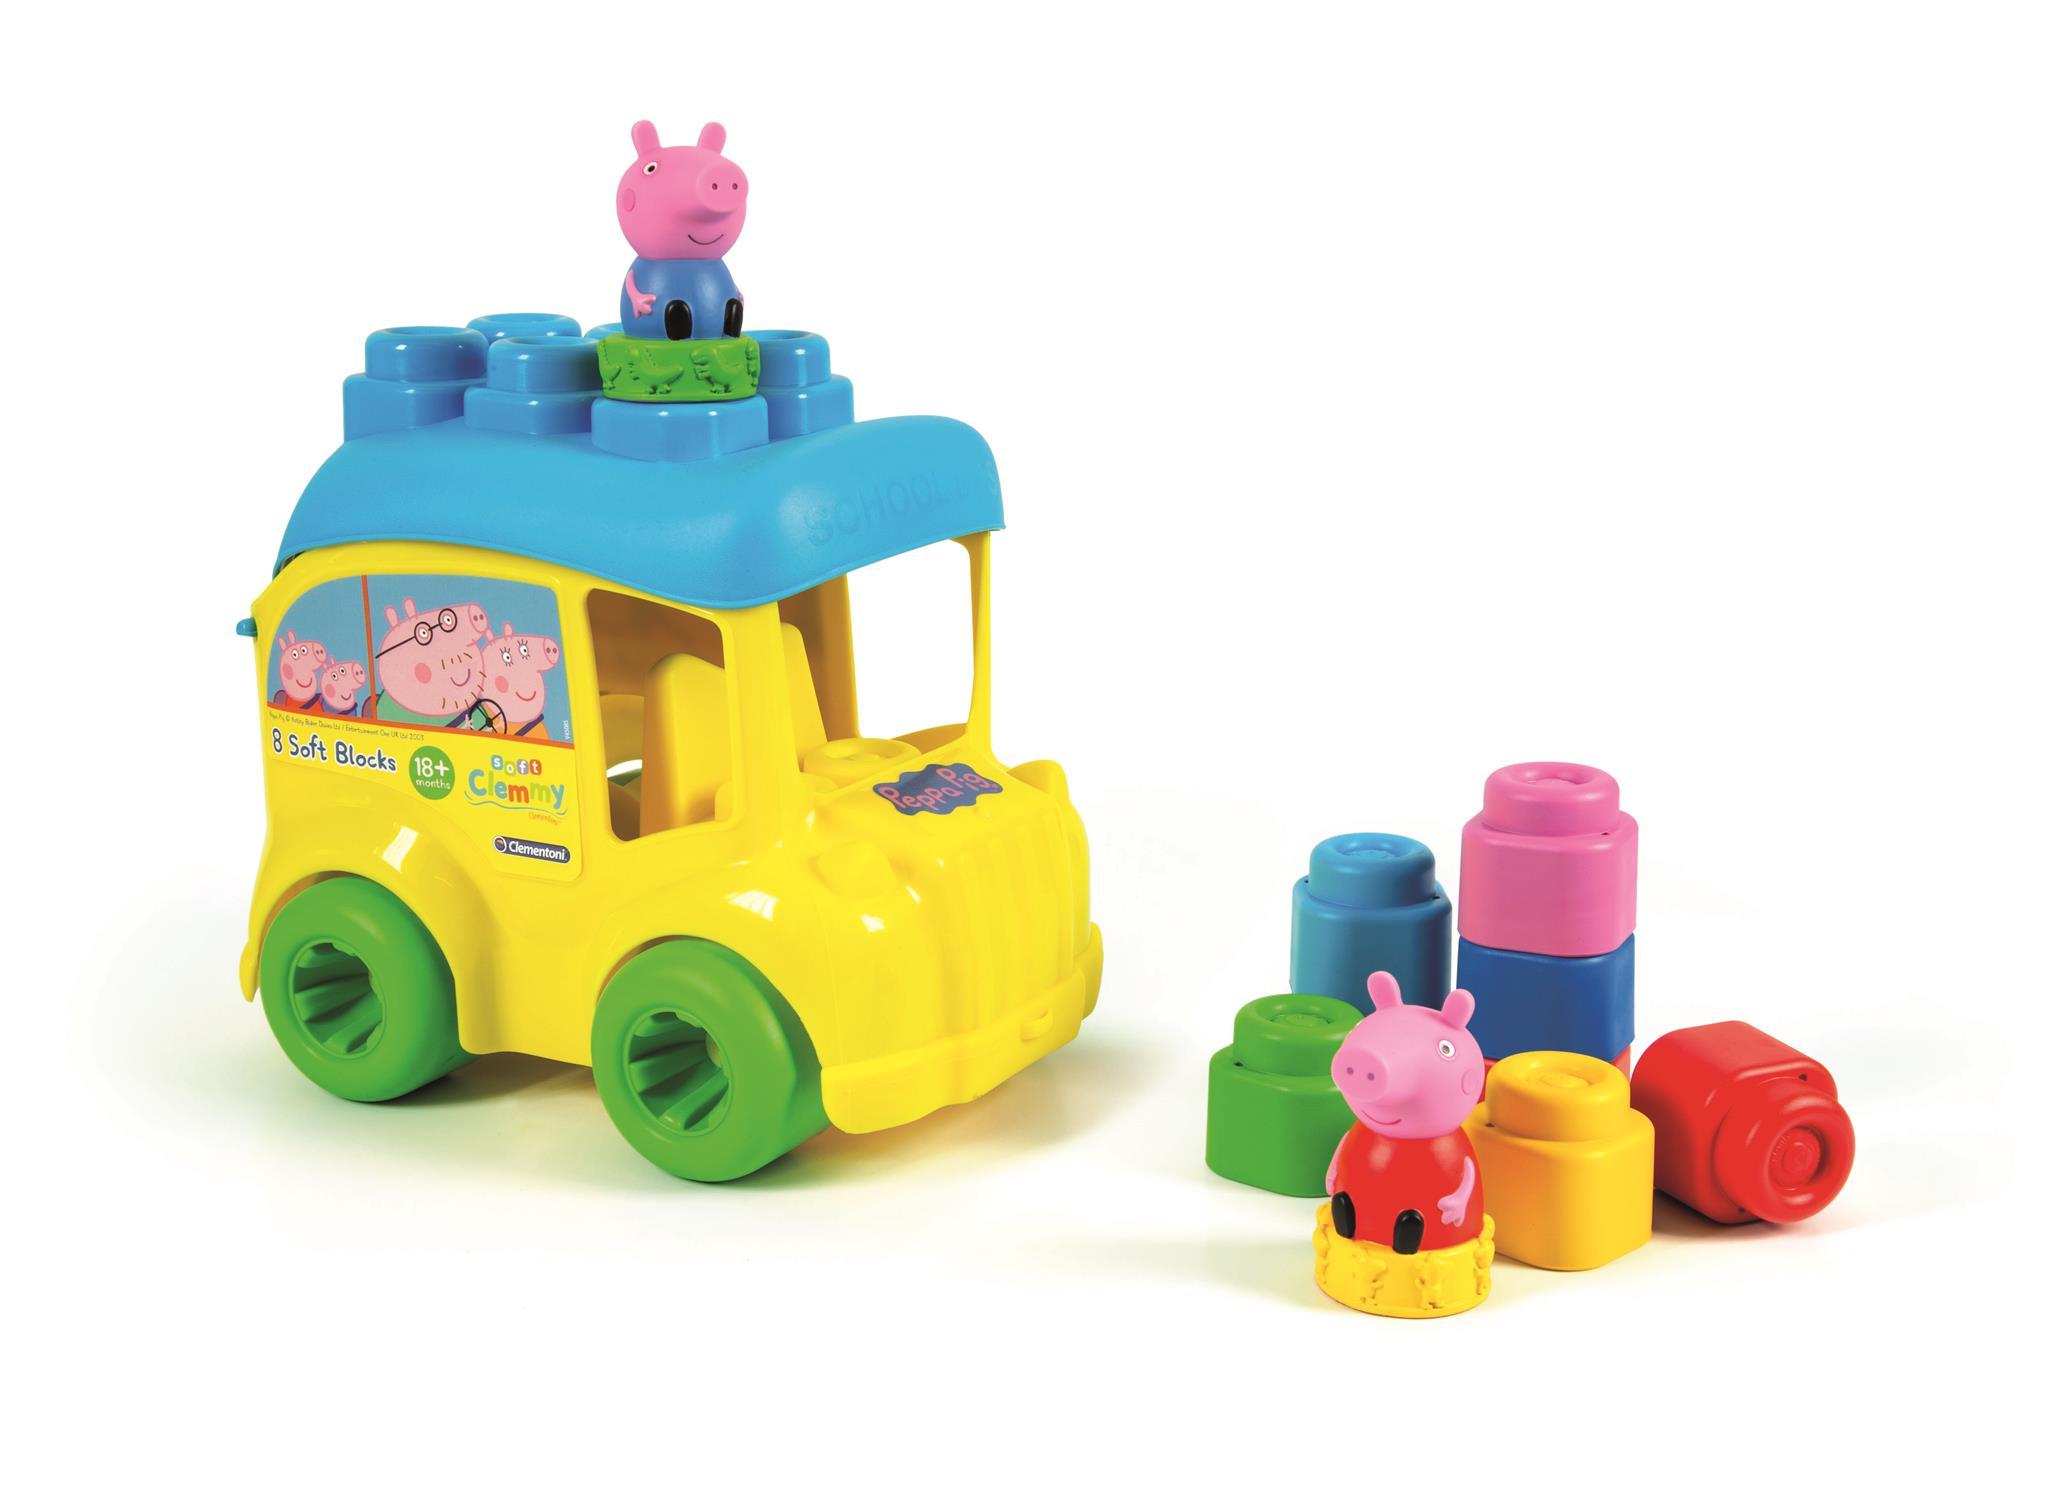 CLEMMY BABY AUTOBUS PEPPA PIG 17248 - N30019